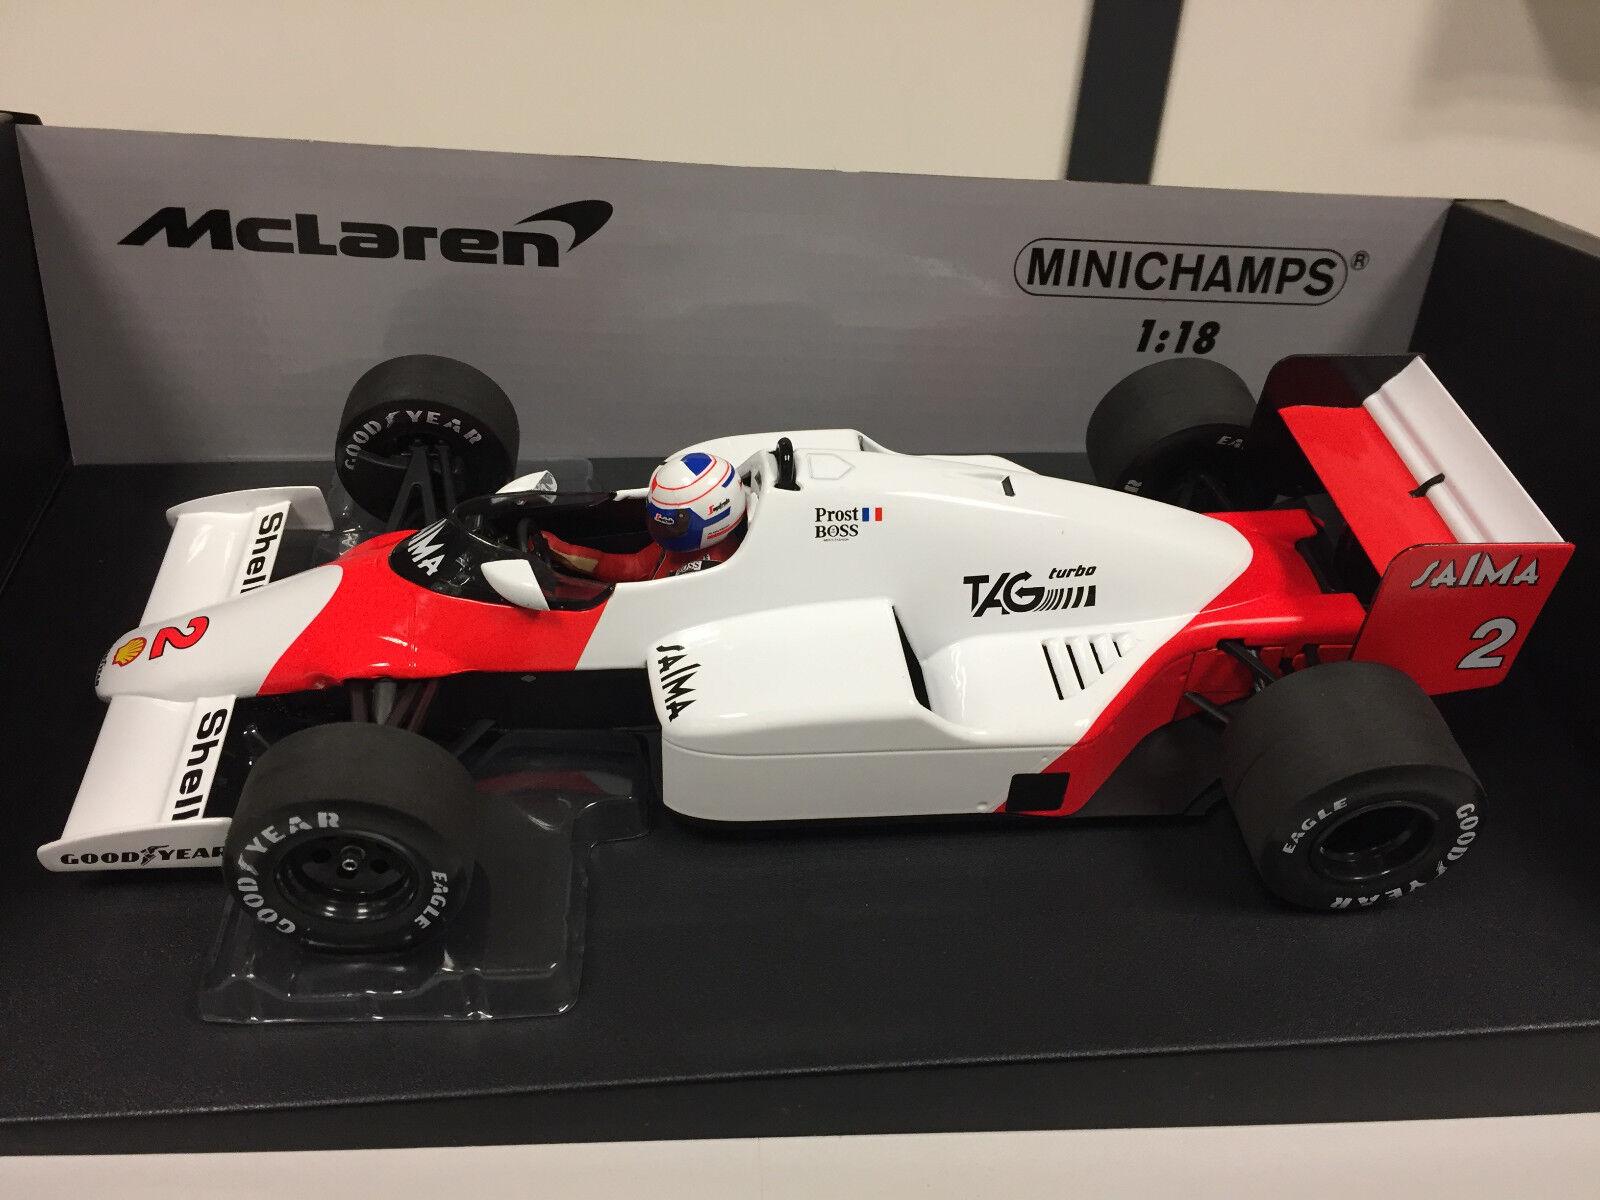 Minichamps F1 Wc Mclaren Mp4 2b A. Prost 1985 1 18 530851802 2